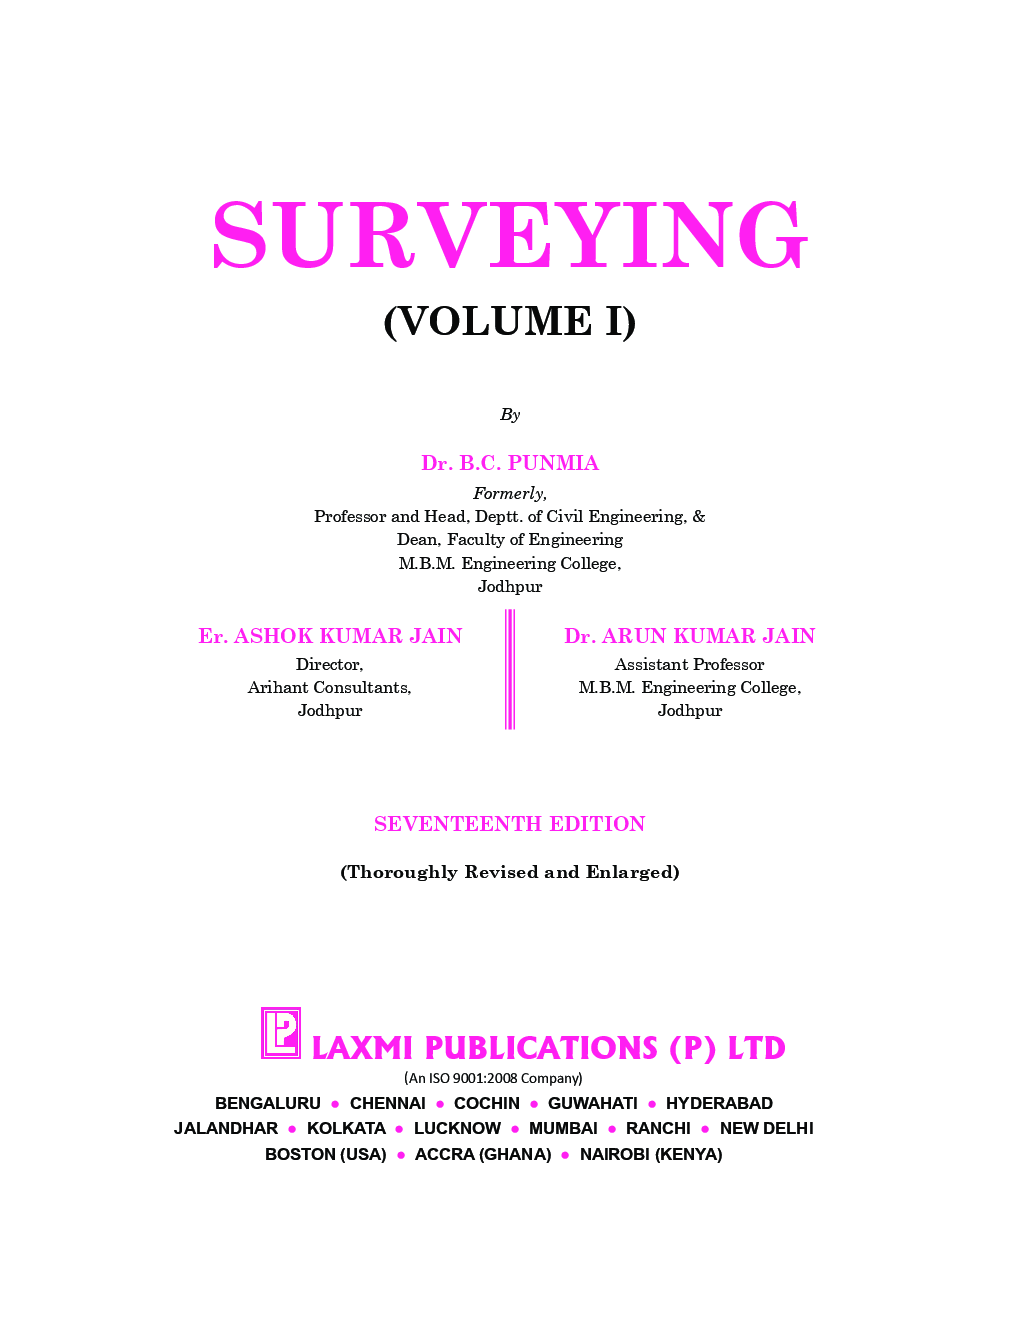 Surveying Vol. 1 - Page 4